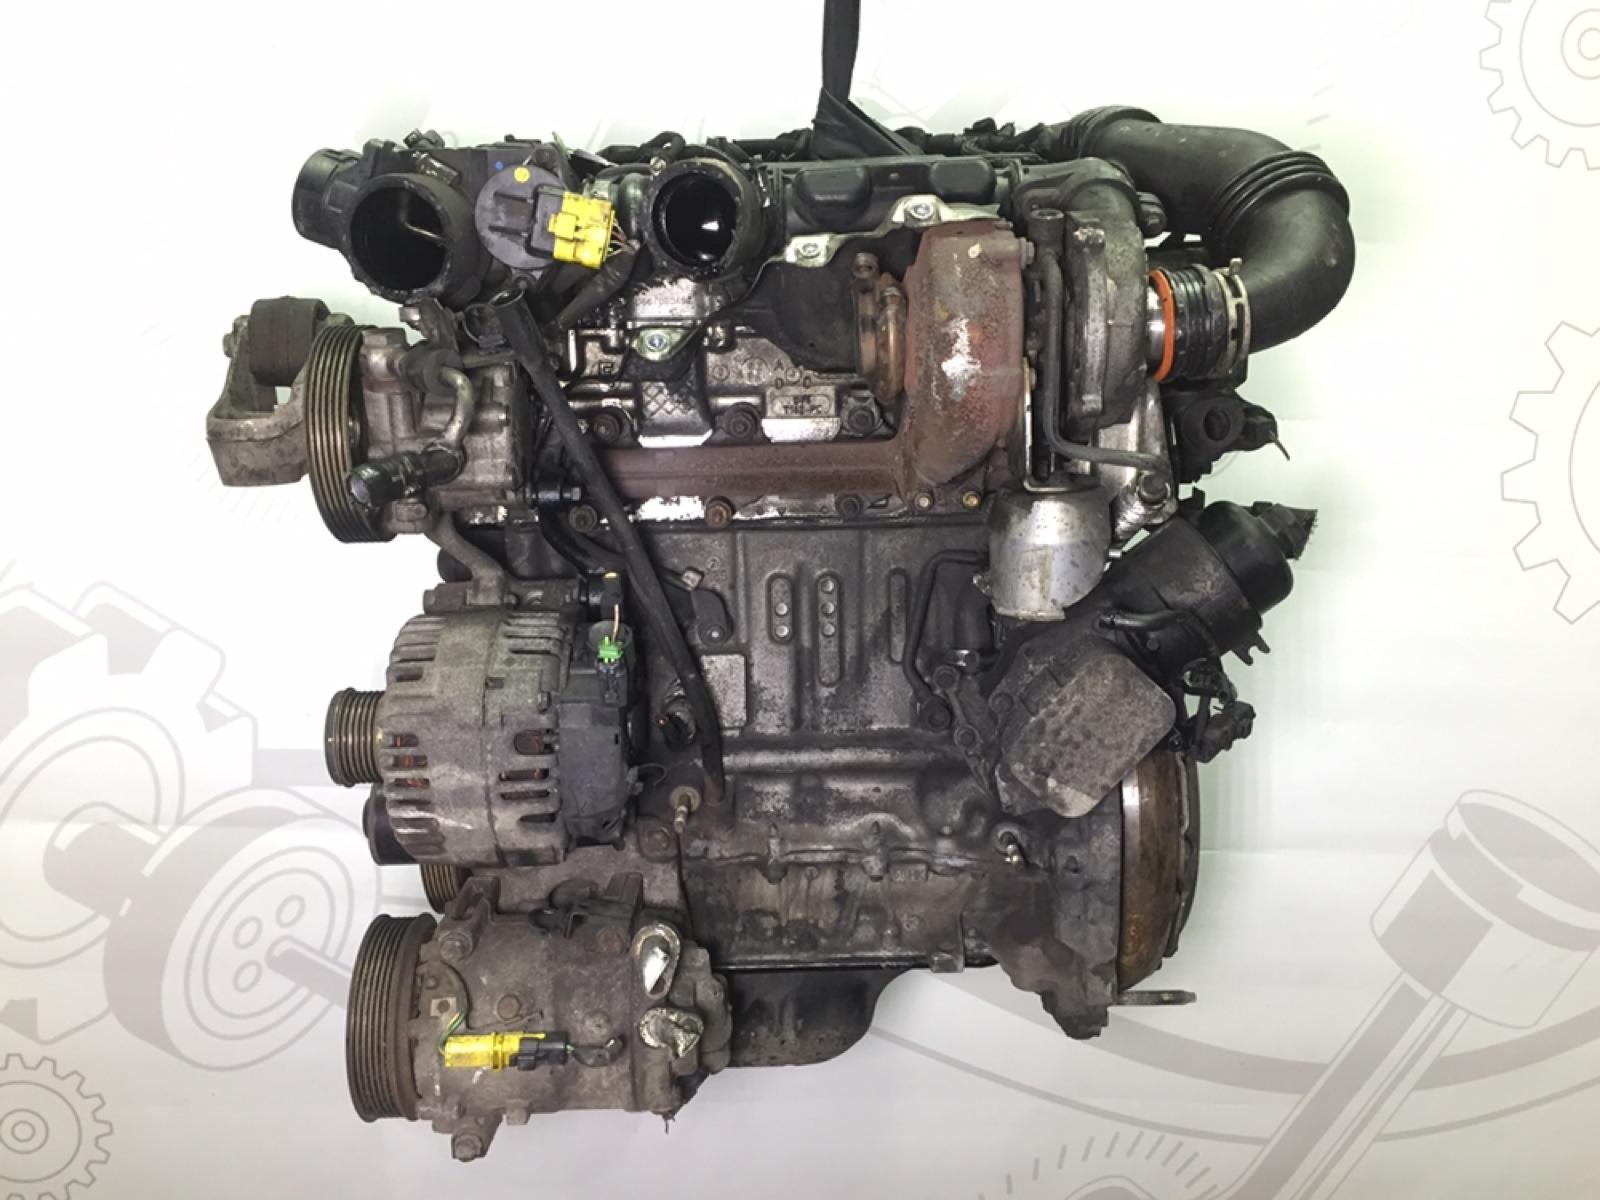 Двигатель Peugeot 407 1.6 HDI 2005 (б/у)